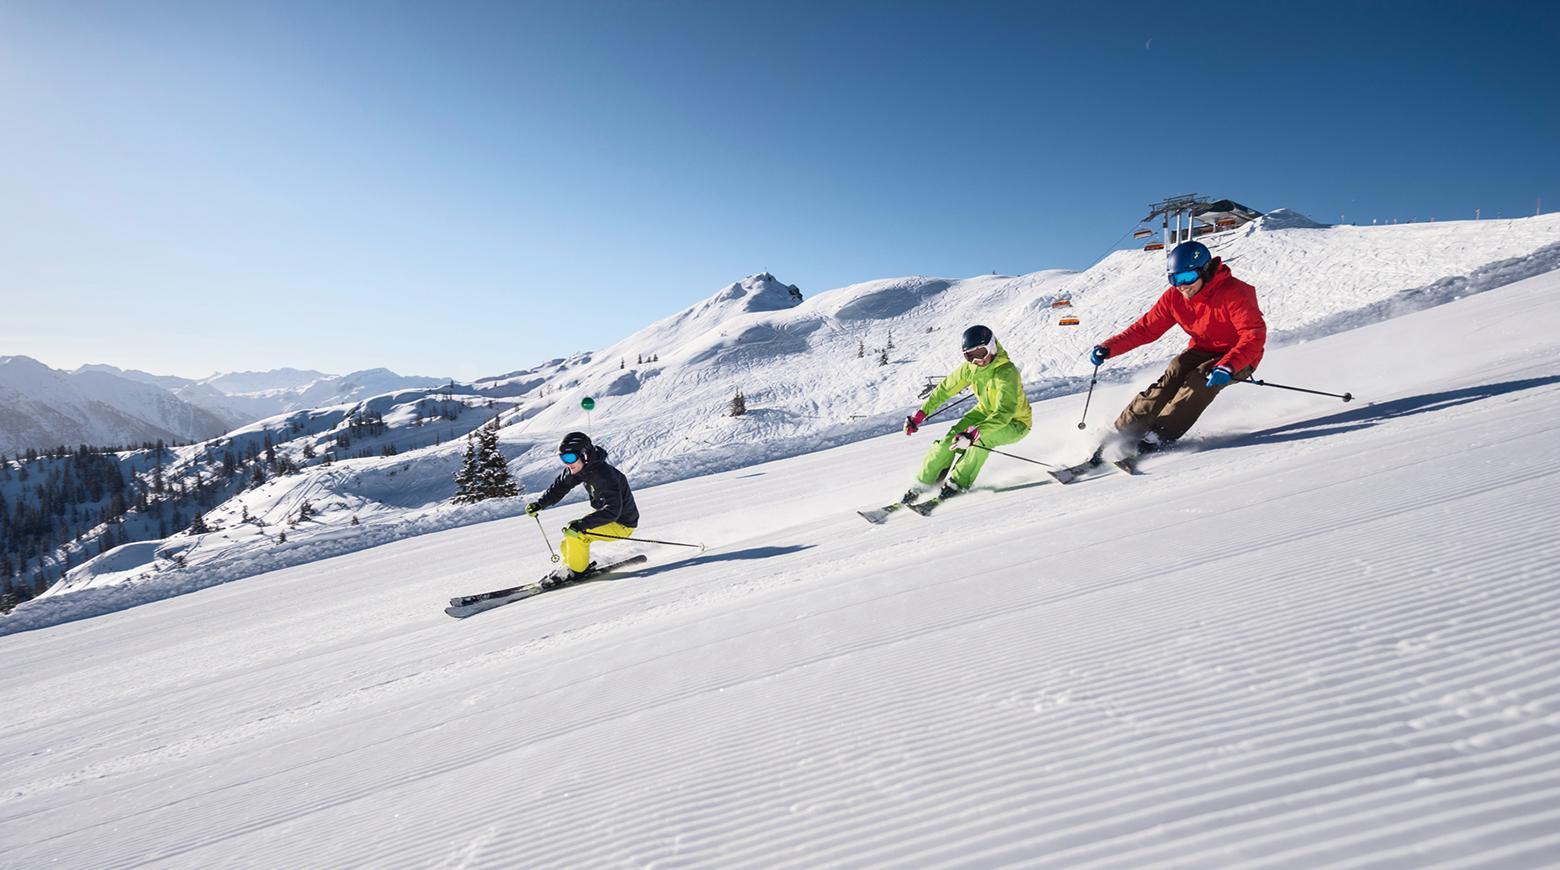 Skiurlaub in Flachau, Skiverbund Ski amadé